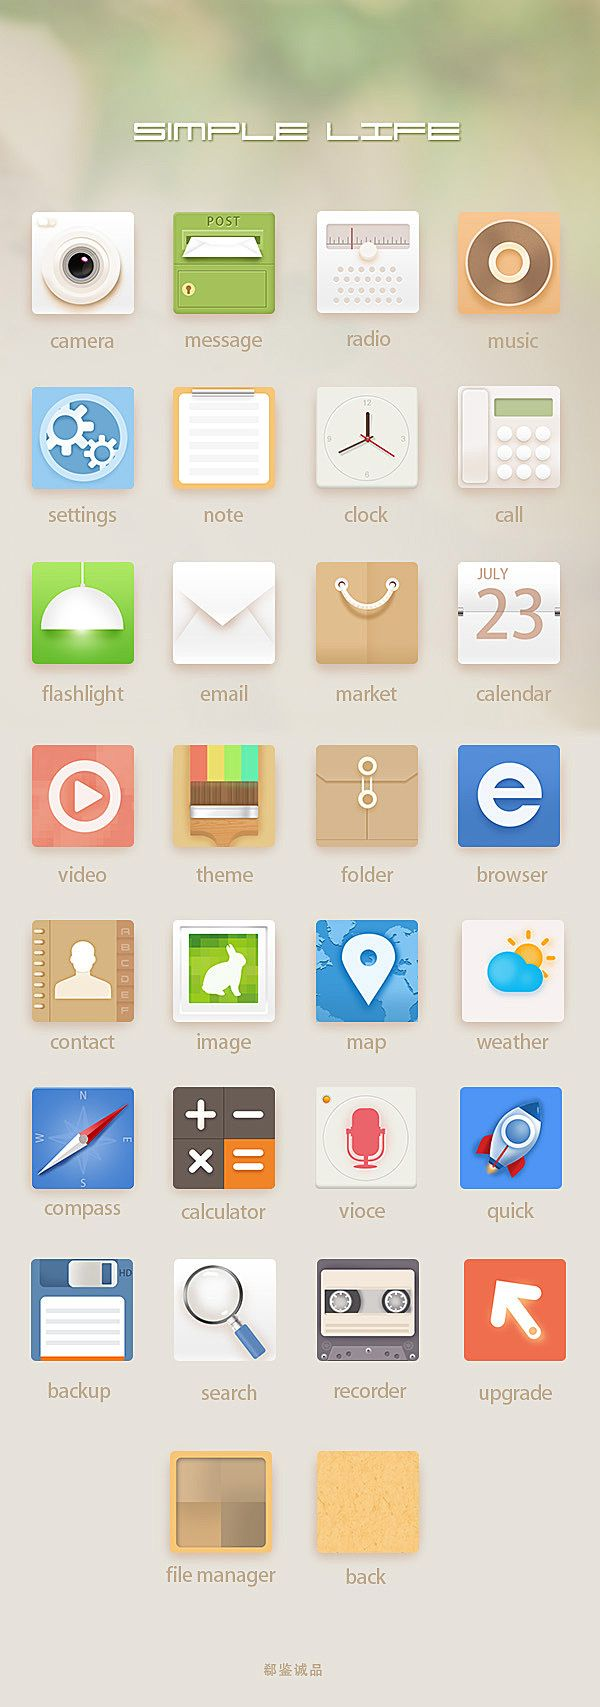 小白4号采集到主题(159图)_花瓣UI 交互设计 App icon design, Icon design